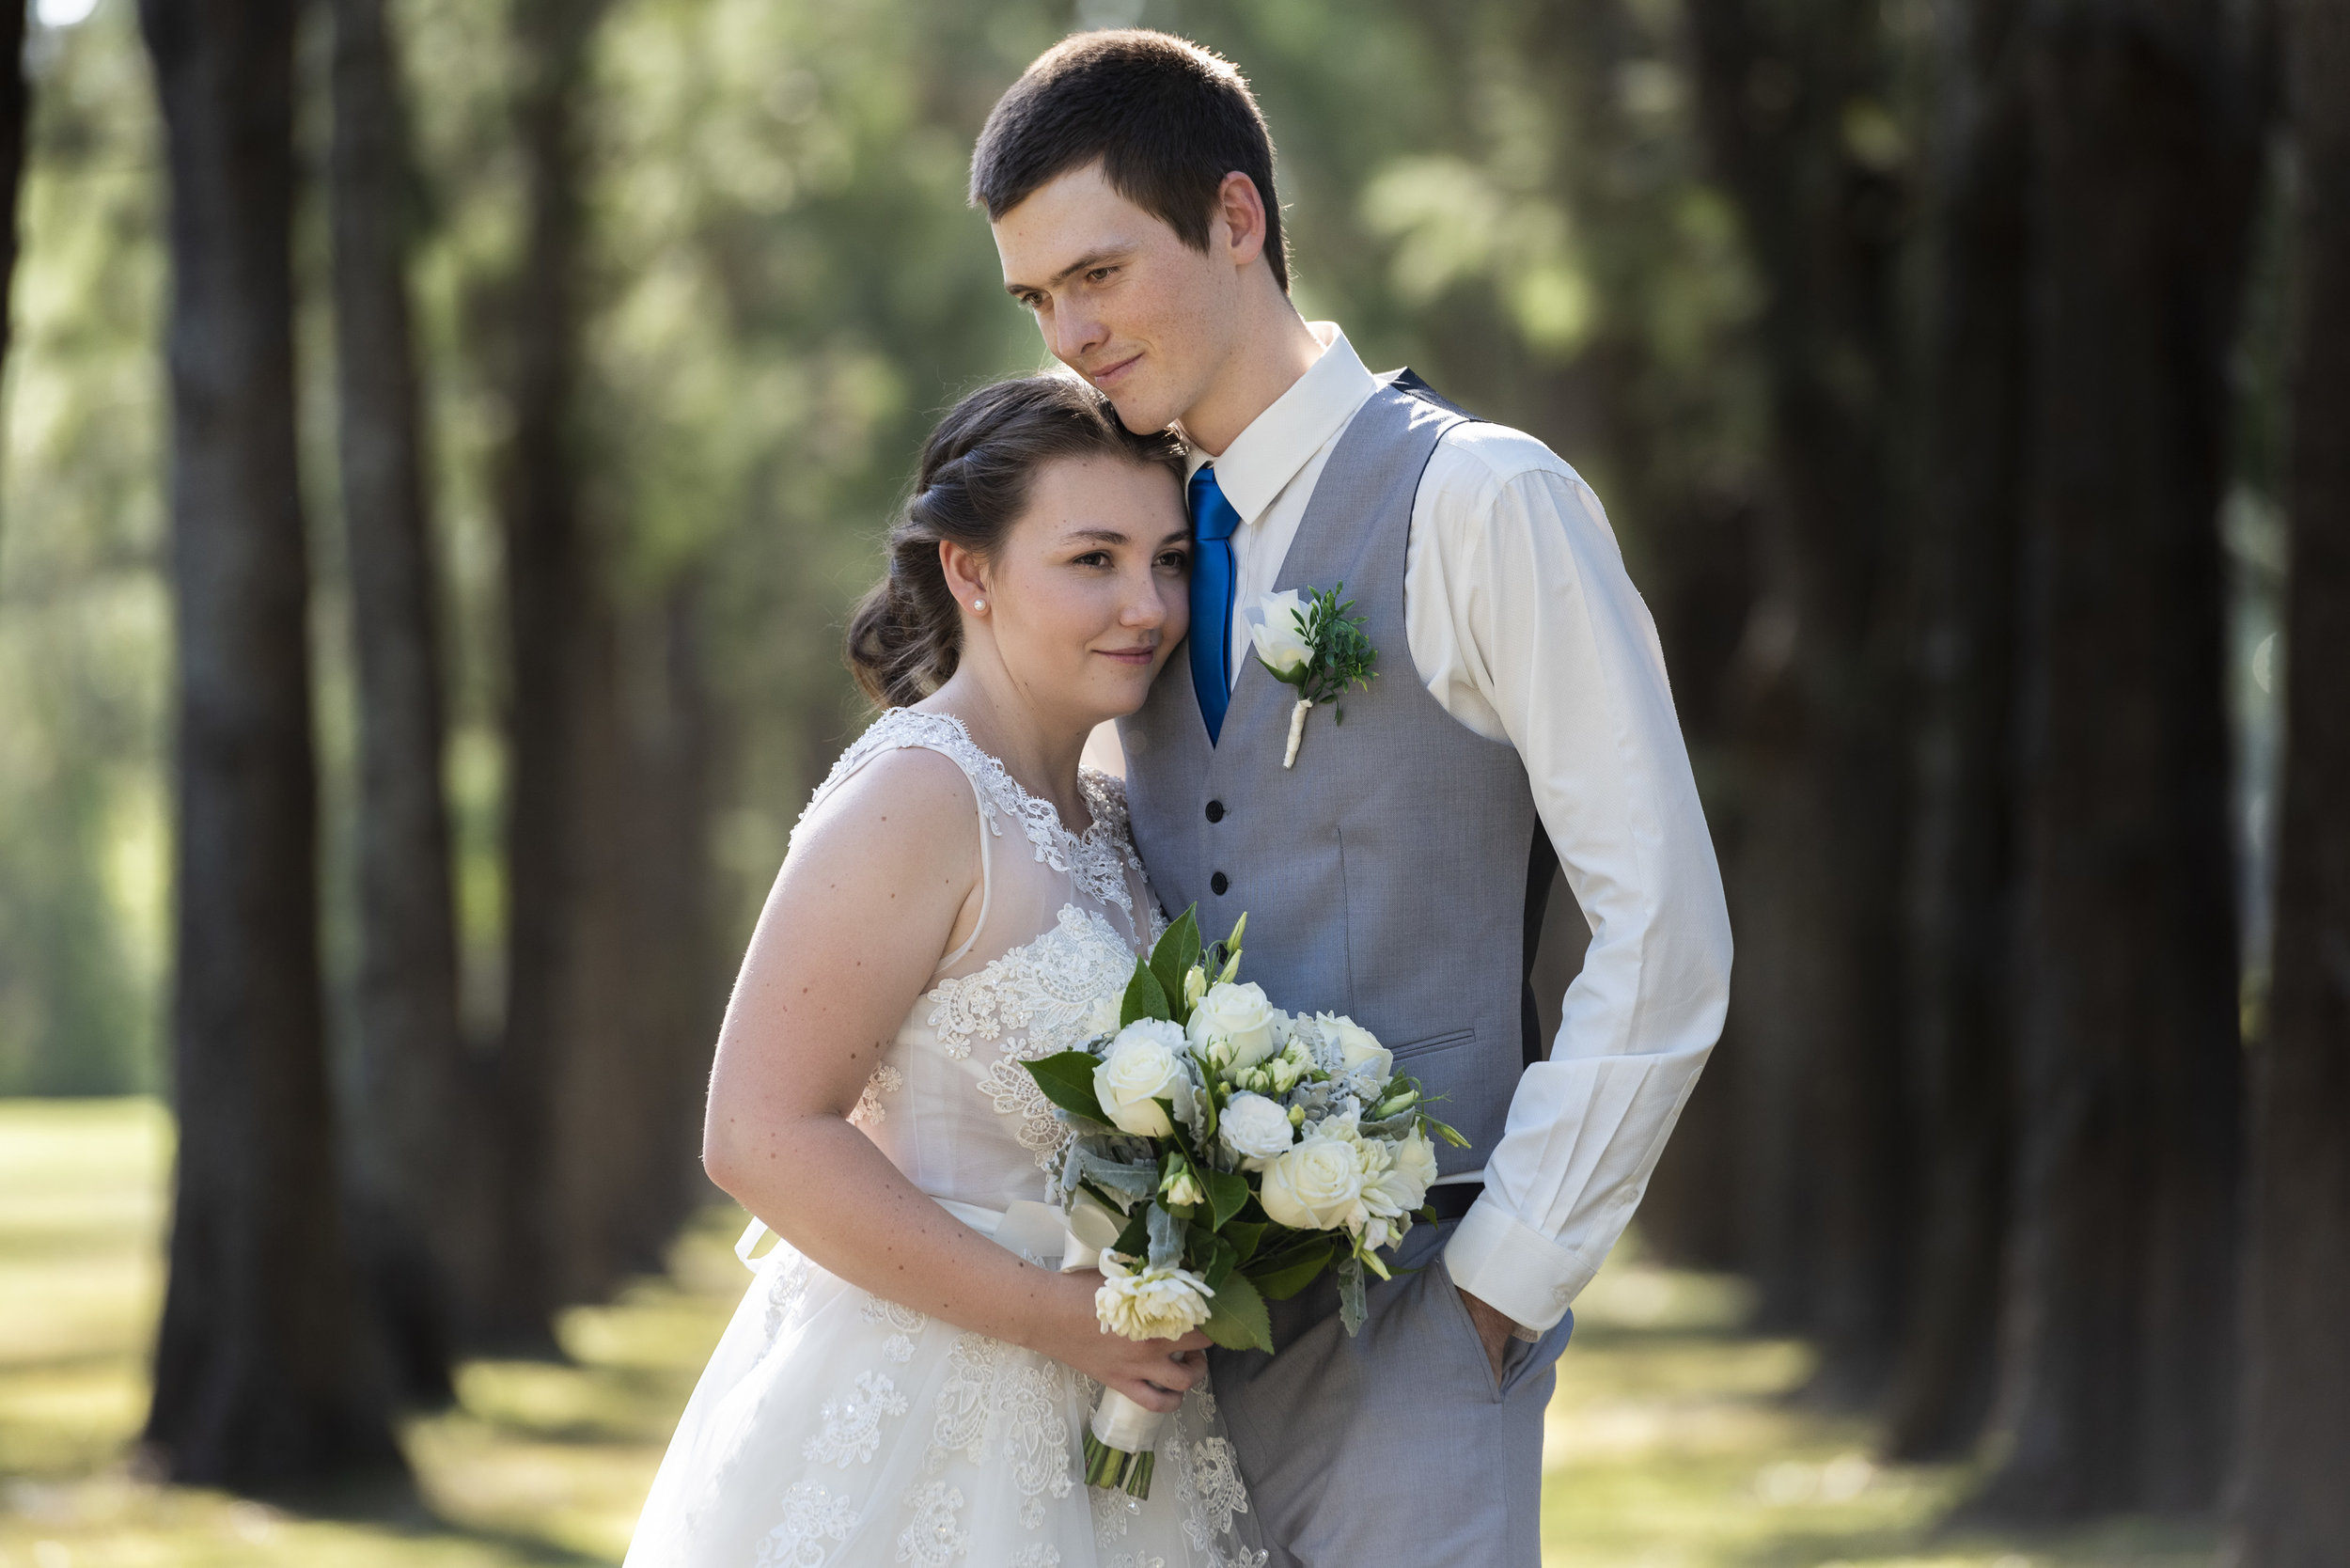 weddings by atelier photography-wedding-01-23.jpg